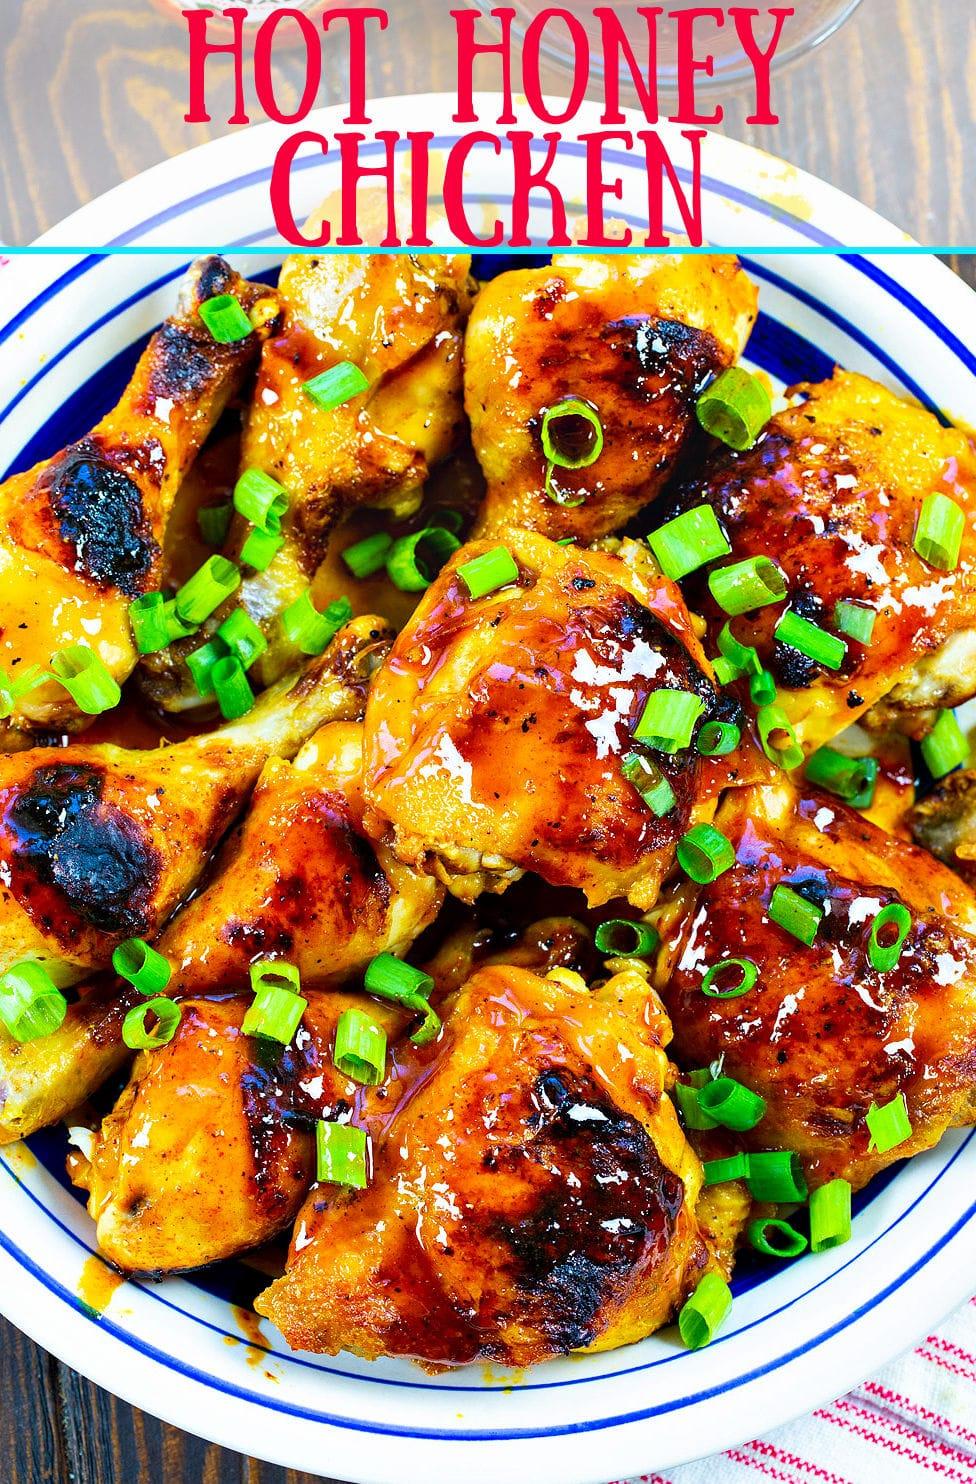 Hot Honey Chicken on a plate.